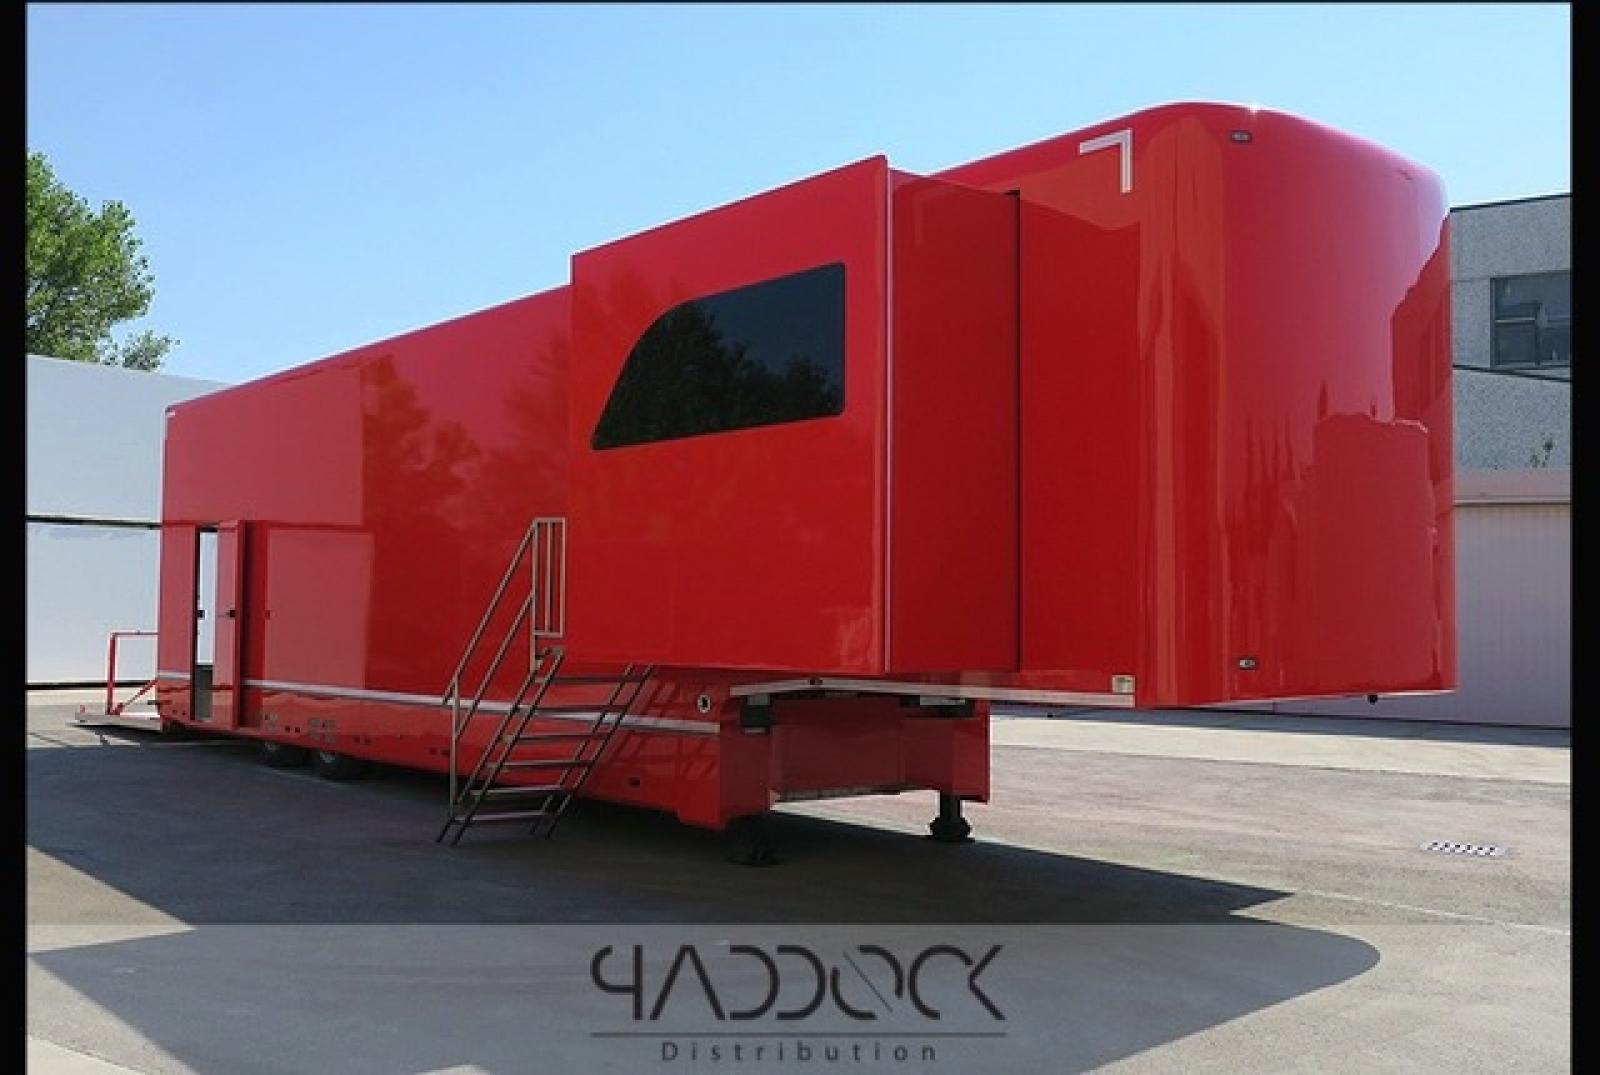 - NEW 2020 ASTA CAR TRAILER BY PADDOCK DISTRIBUTION - - 1